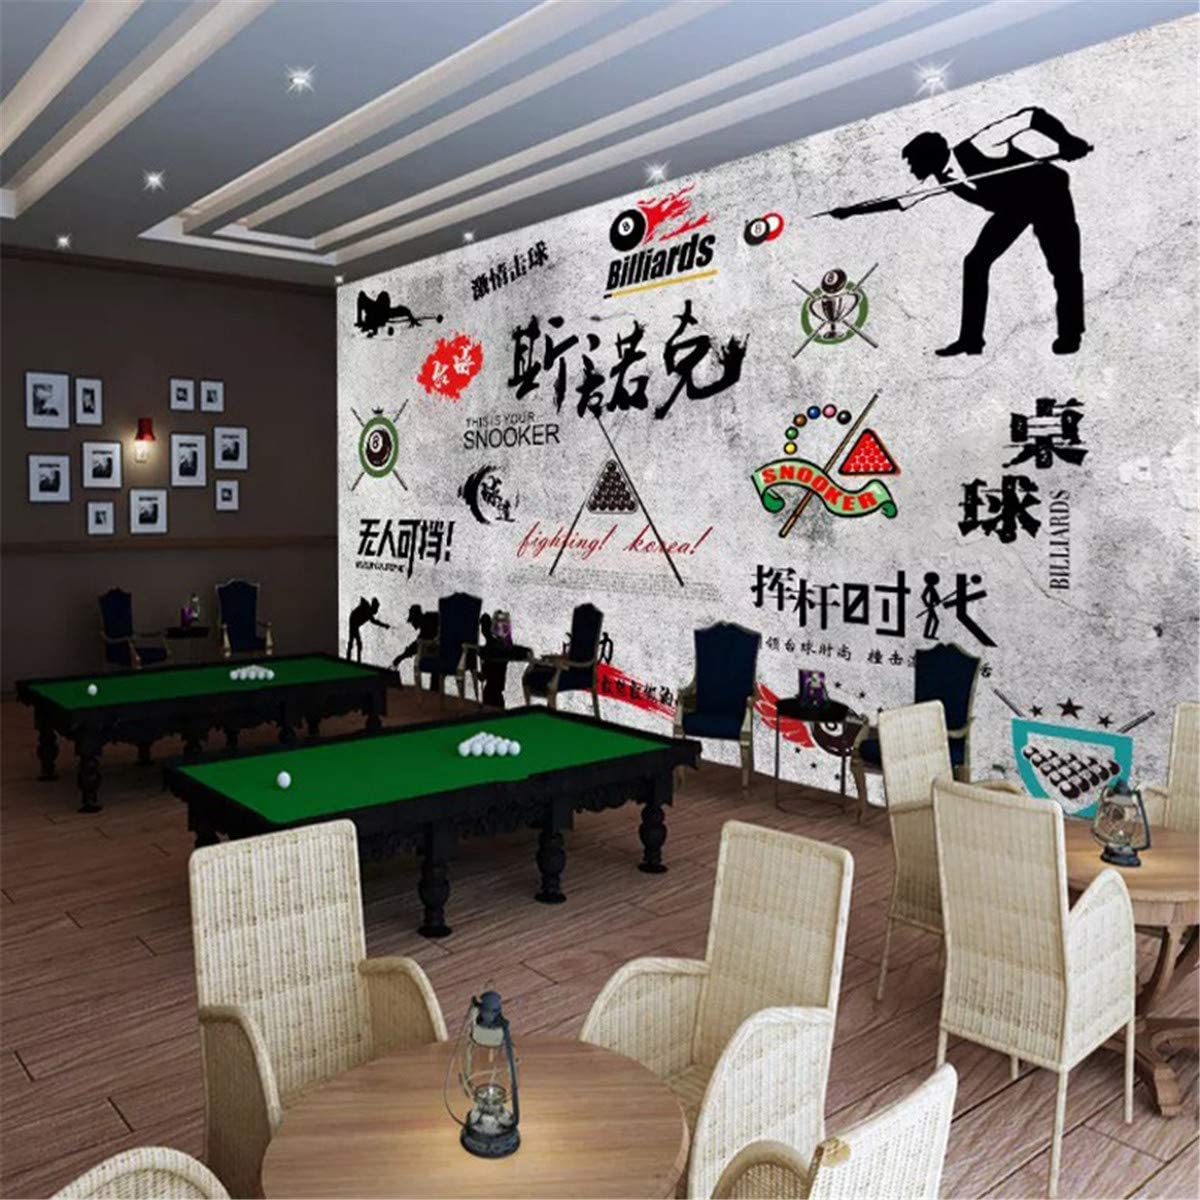 FOREVERFL Fondo de Pantalla 3D Papel Tapiz de Sala de Billar KTV Bar Juego Wallpaper Sala de Juegos, 400 * 280 cm: Amazon.es: Hogar